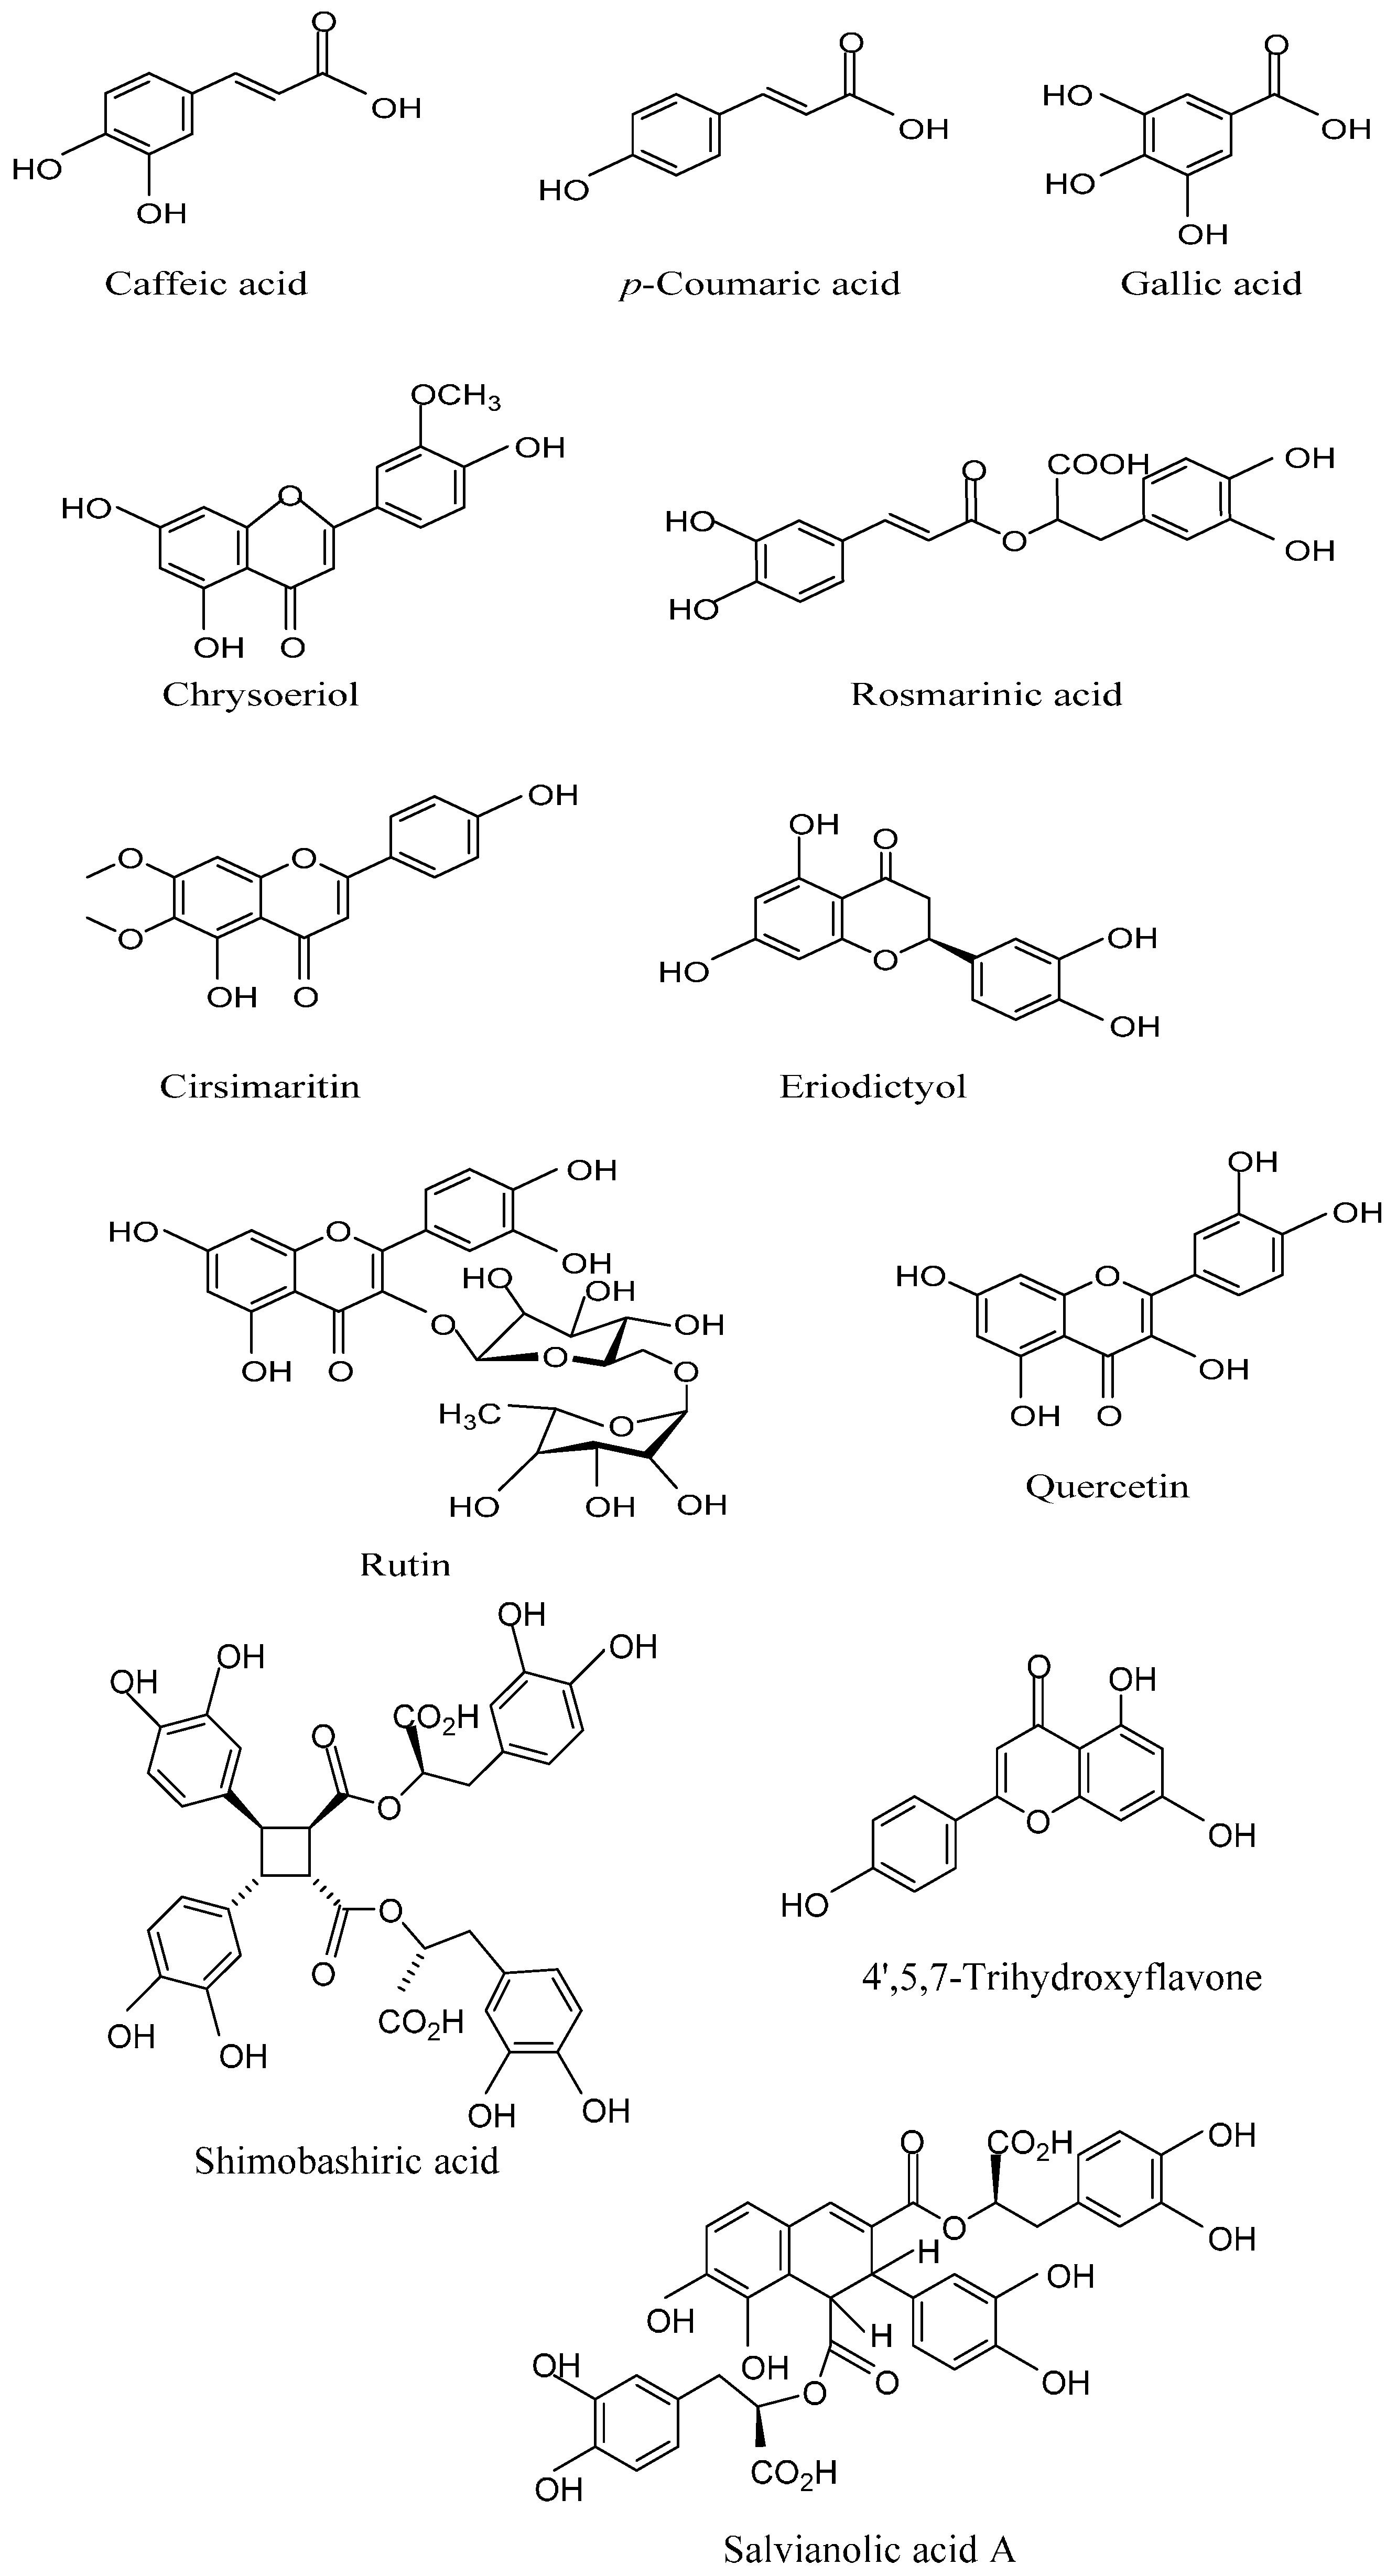 Molecules | Free Full-Text | Plectranthus amboinicus (Lour